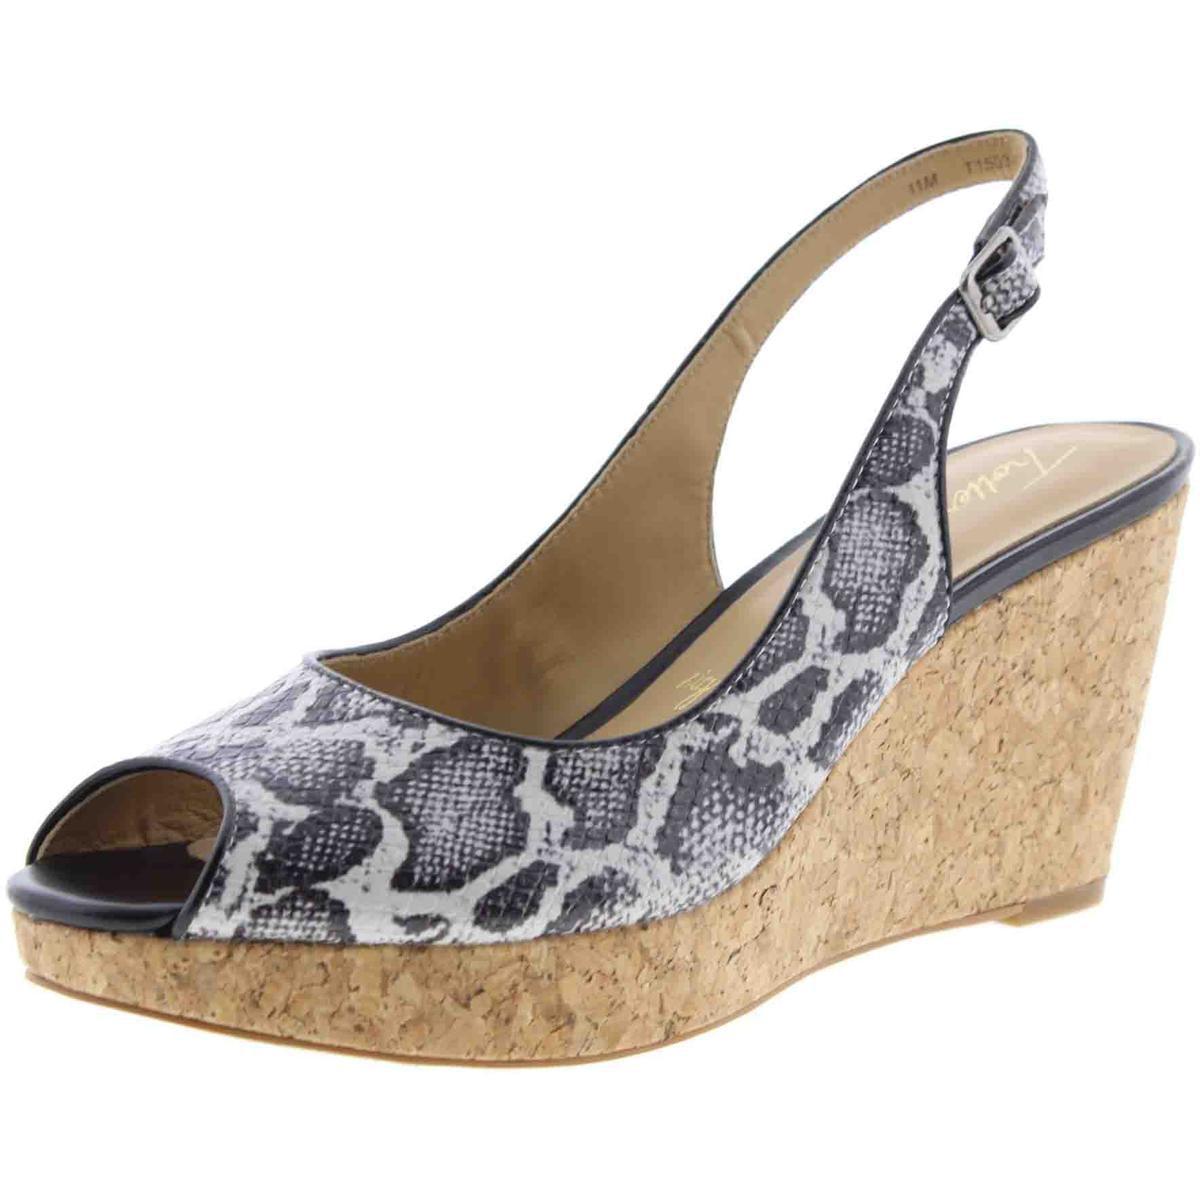 Trotters Womens Allie Cork Peep-Toe Wedge Sandals by Trotters